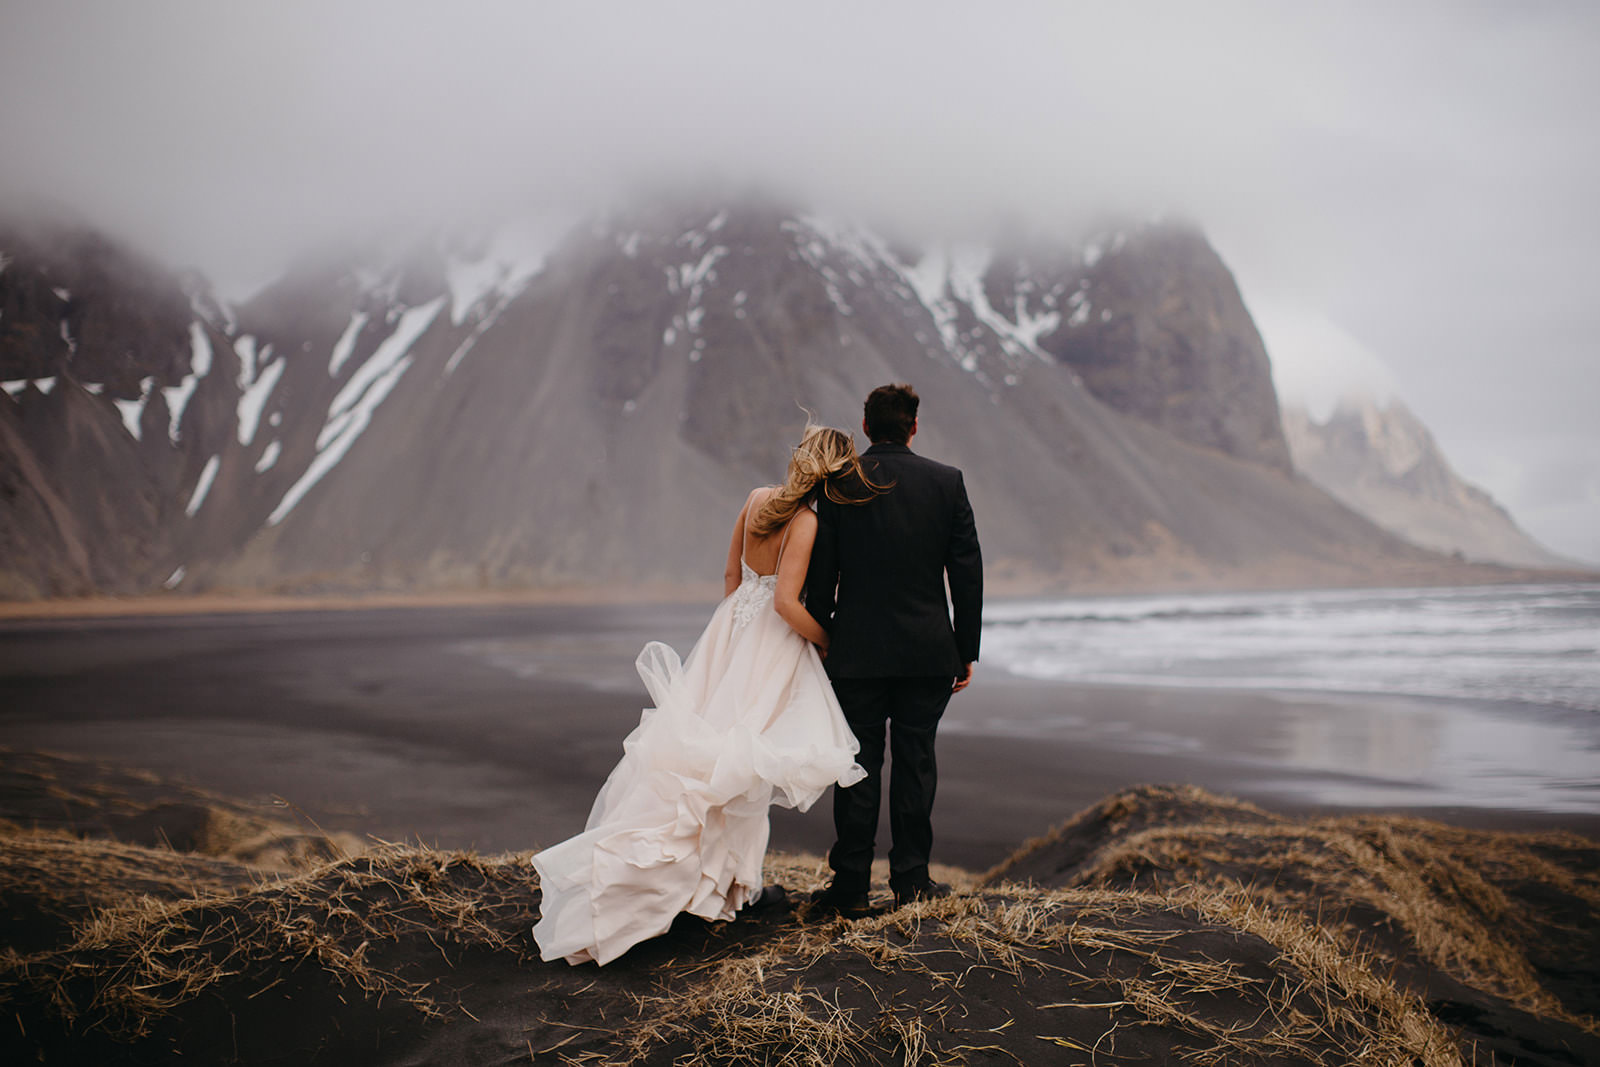 Icelandic Iceland Elopement Wedding Elope Photographer Eloping Reykjavík Vik Black Sand Beach Jökulsárlón Skogafoss Waterfall Vestrahorn Mountain Liz Osban Photography Destination 31.jpg